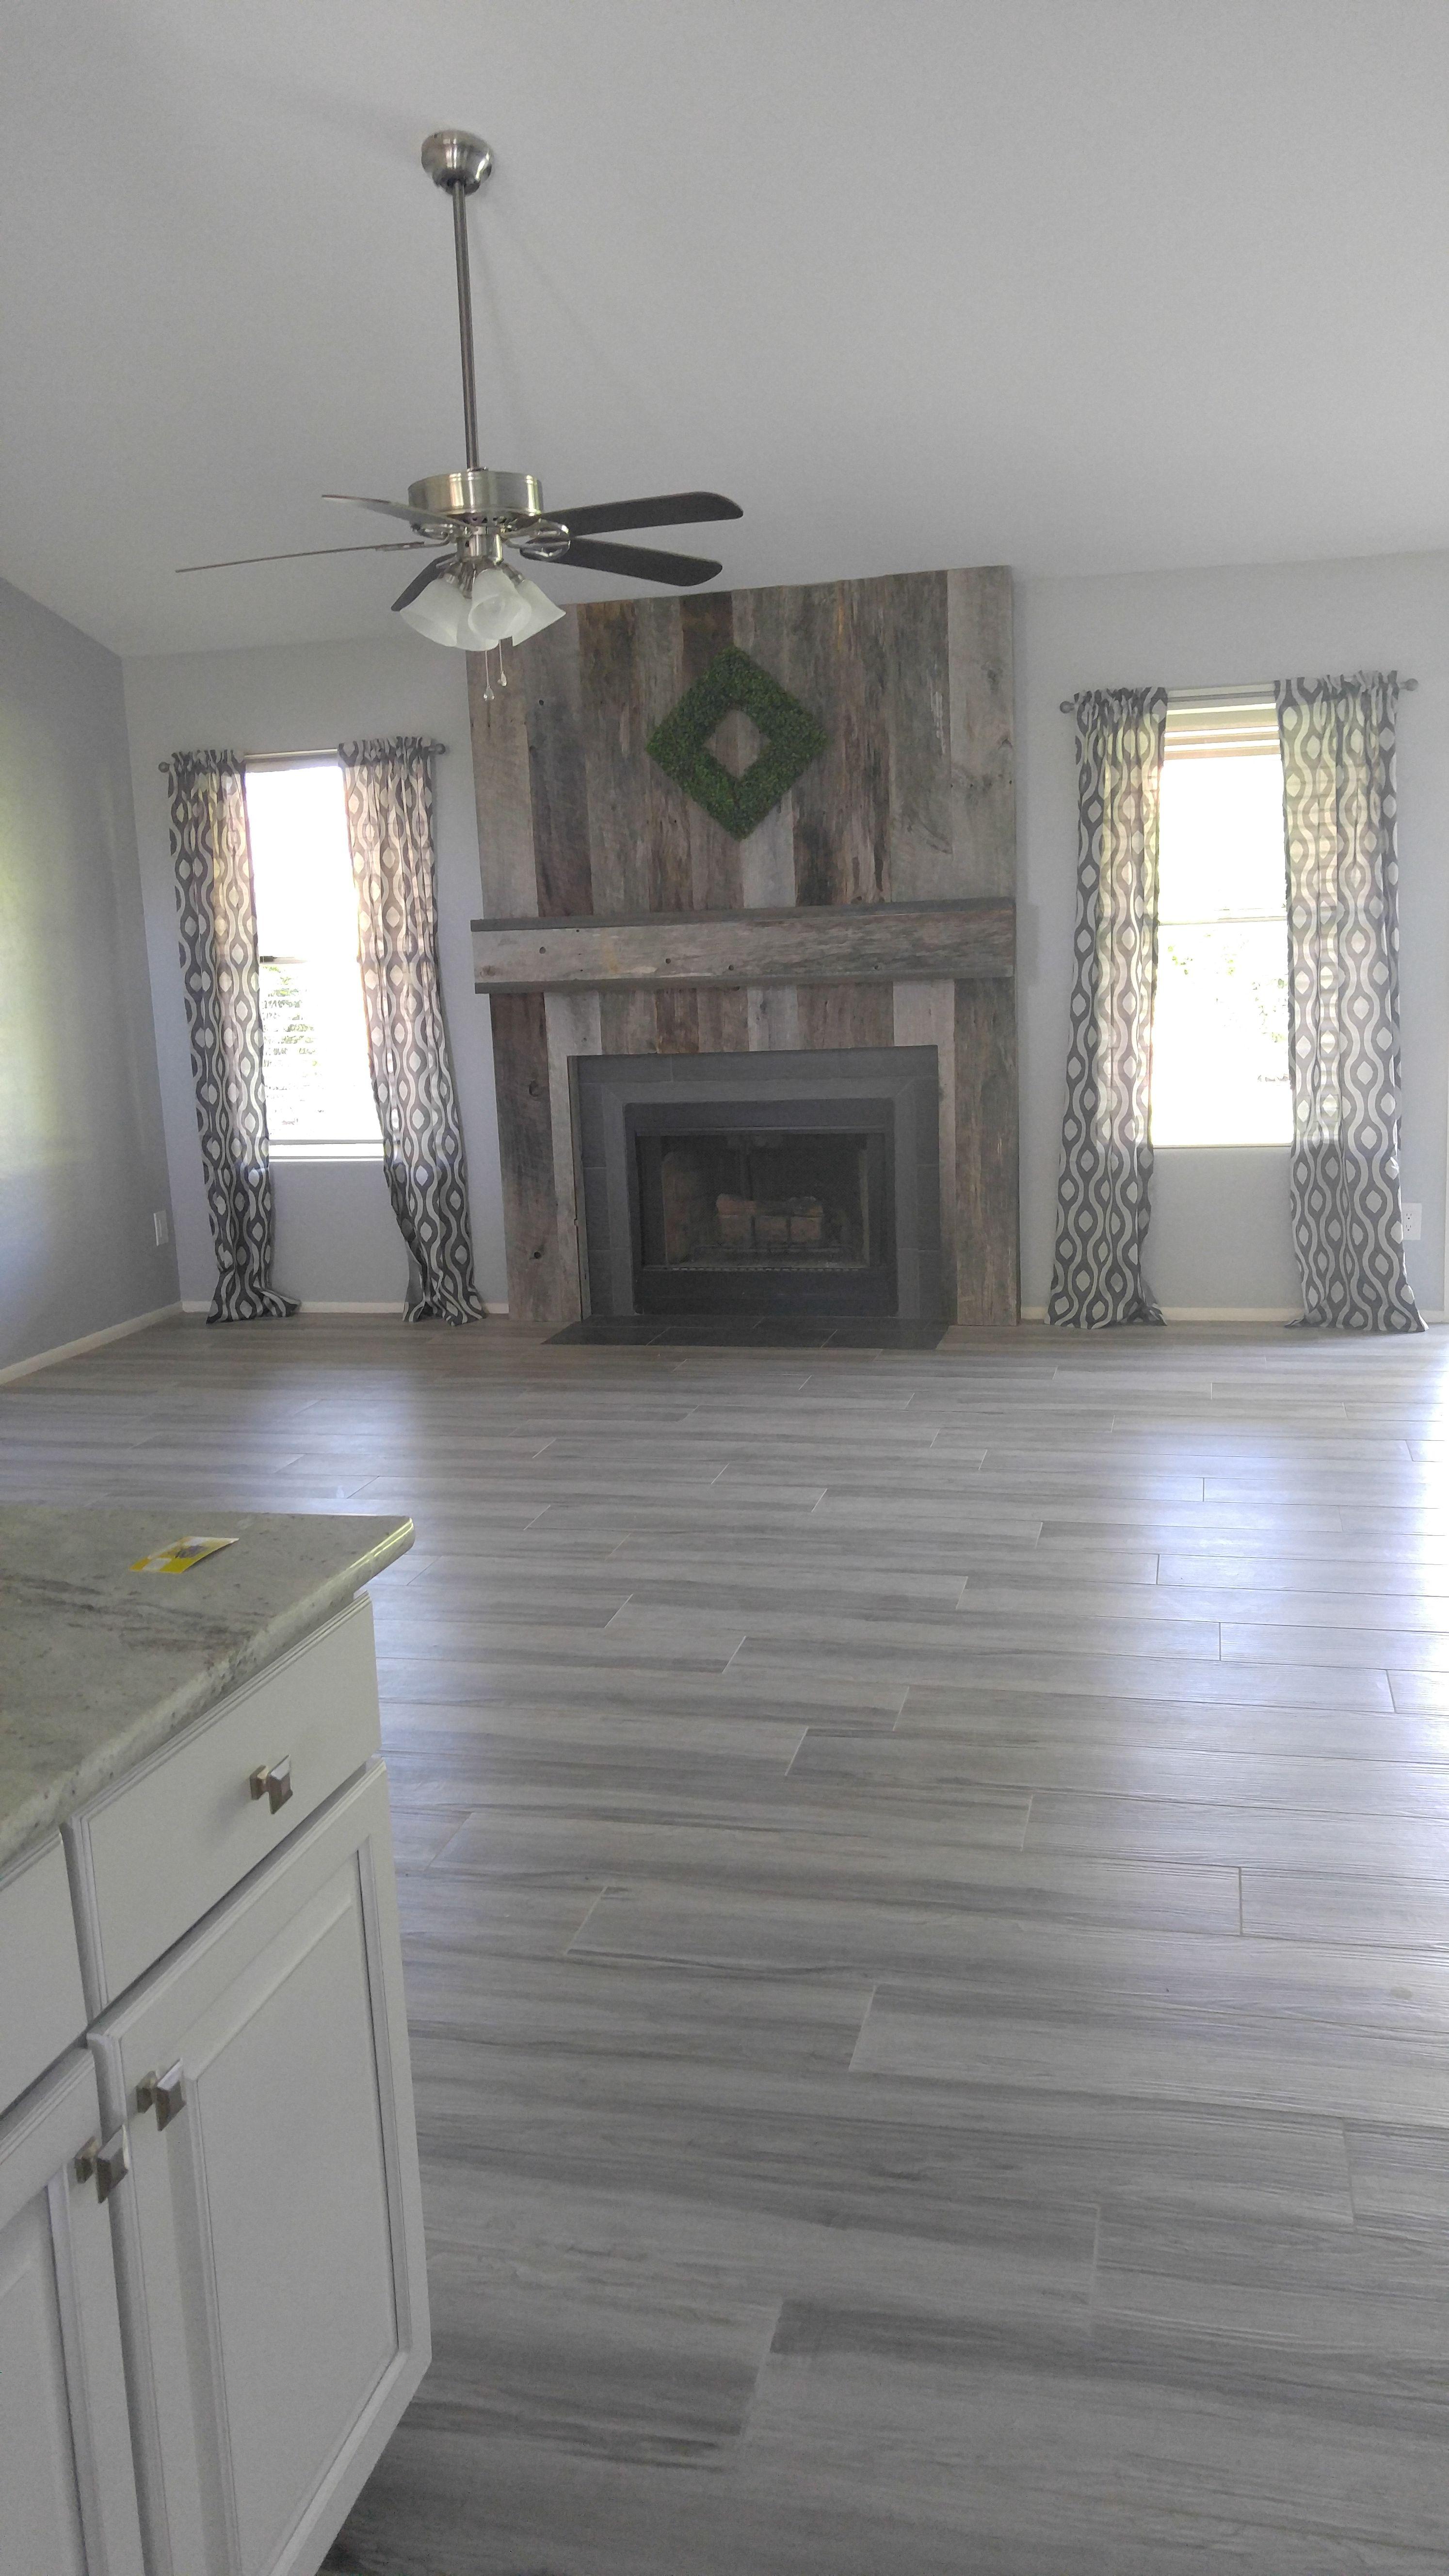 Gray wood look tile flooring. Reclaimed wood fireplace